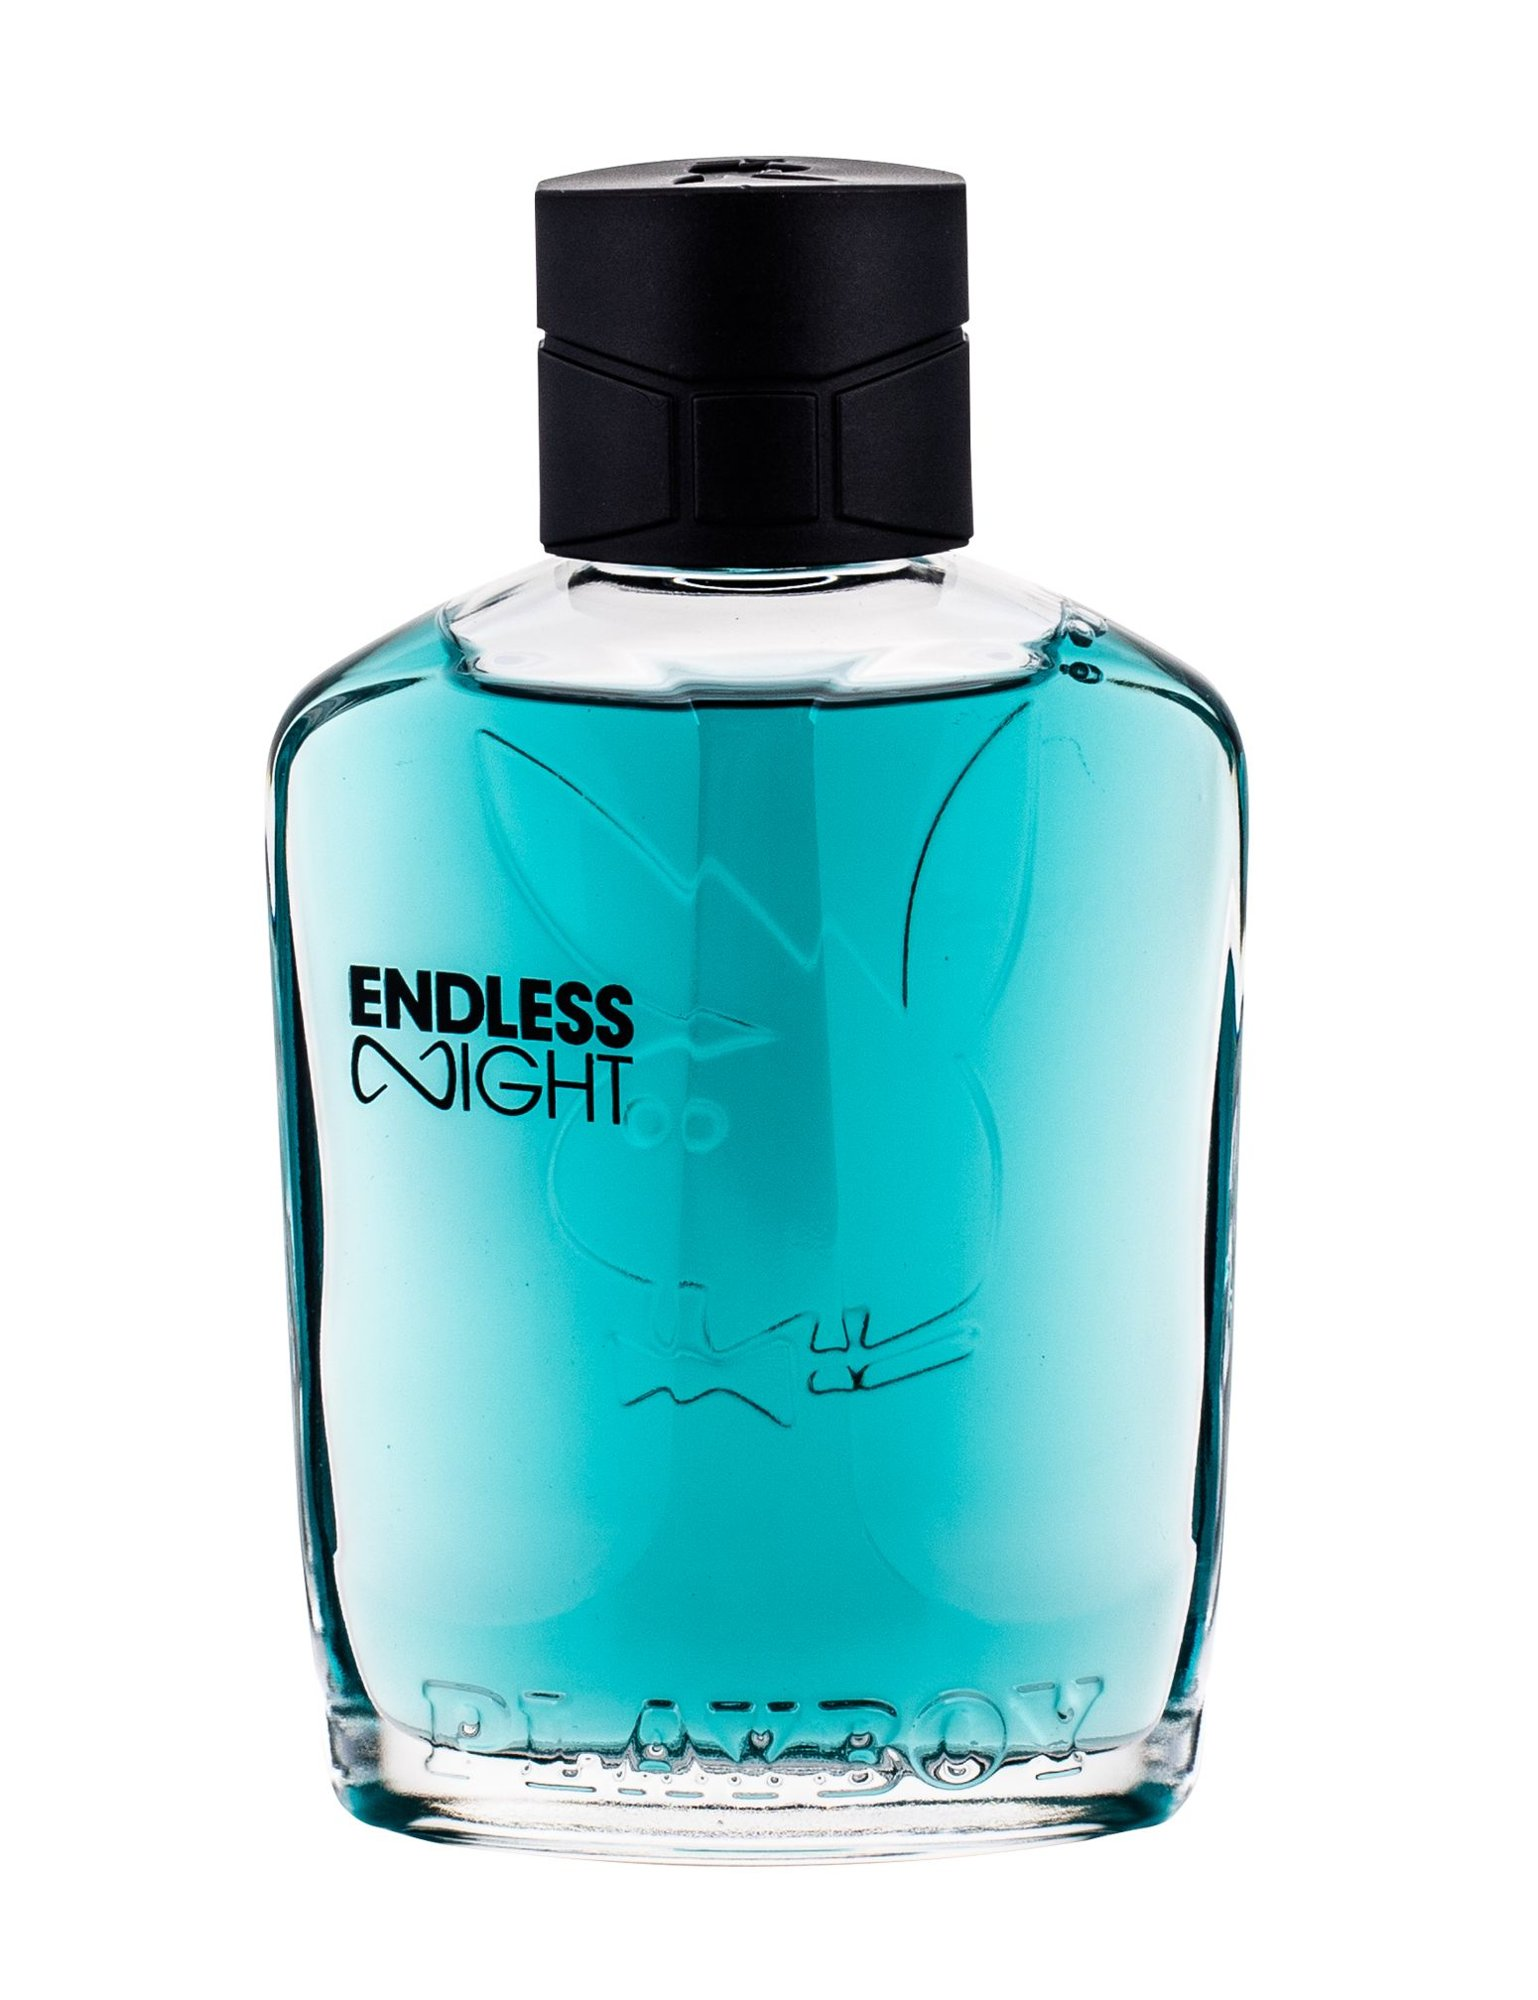 Playboy Endless Night Eau de Toilette 100ml